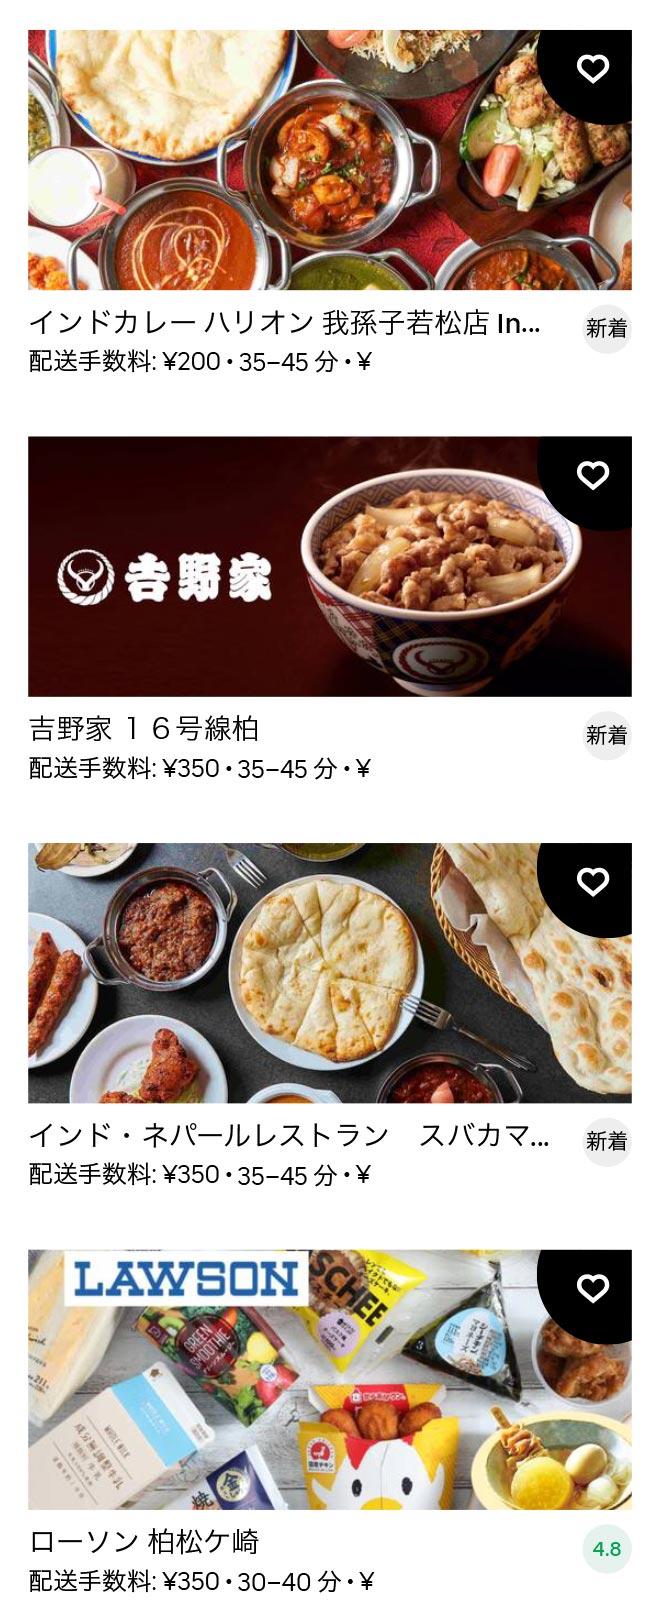 Abiko menu 2011 06